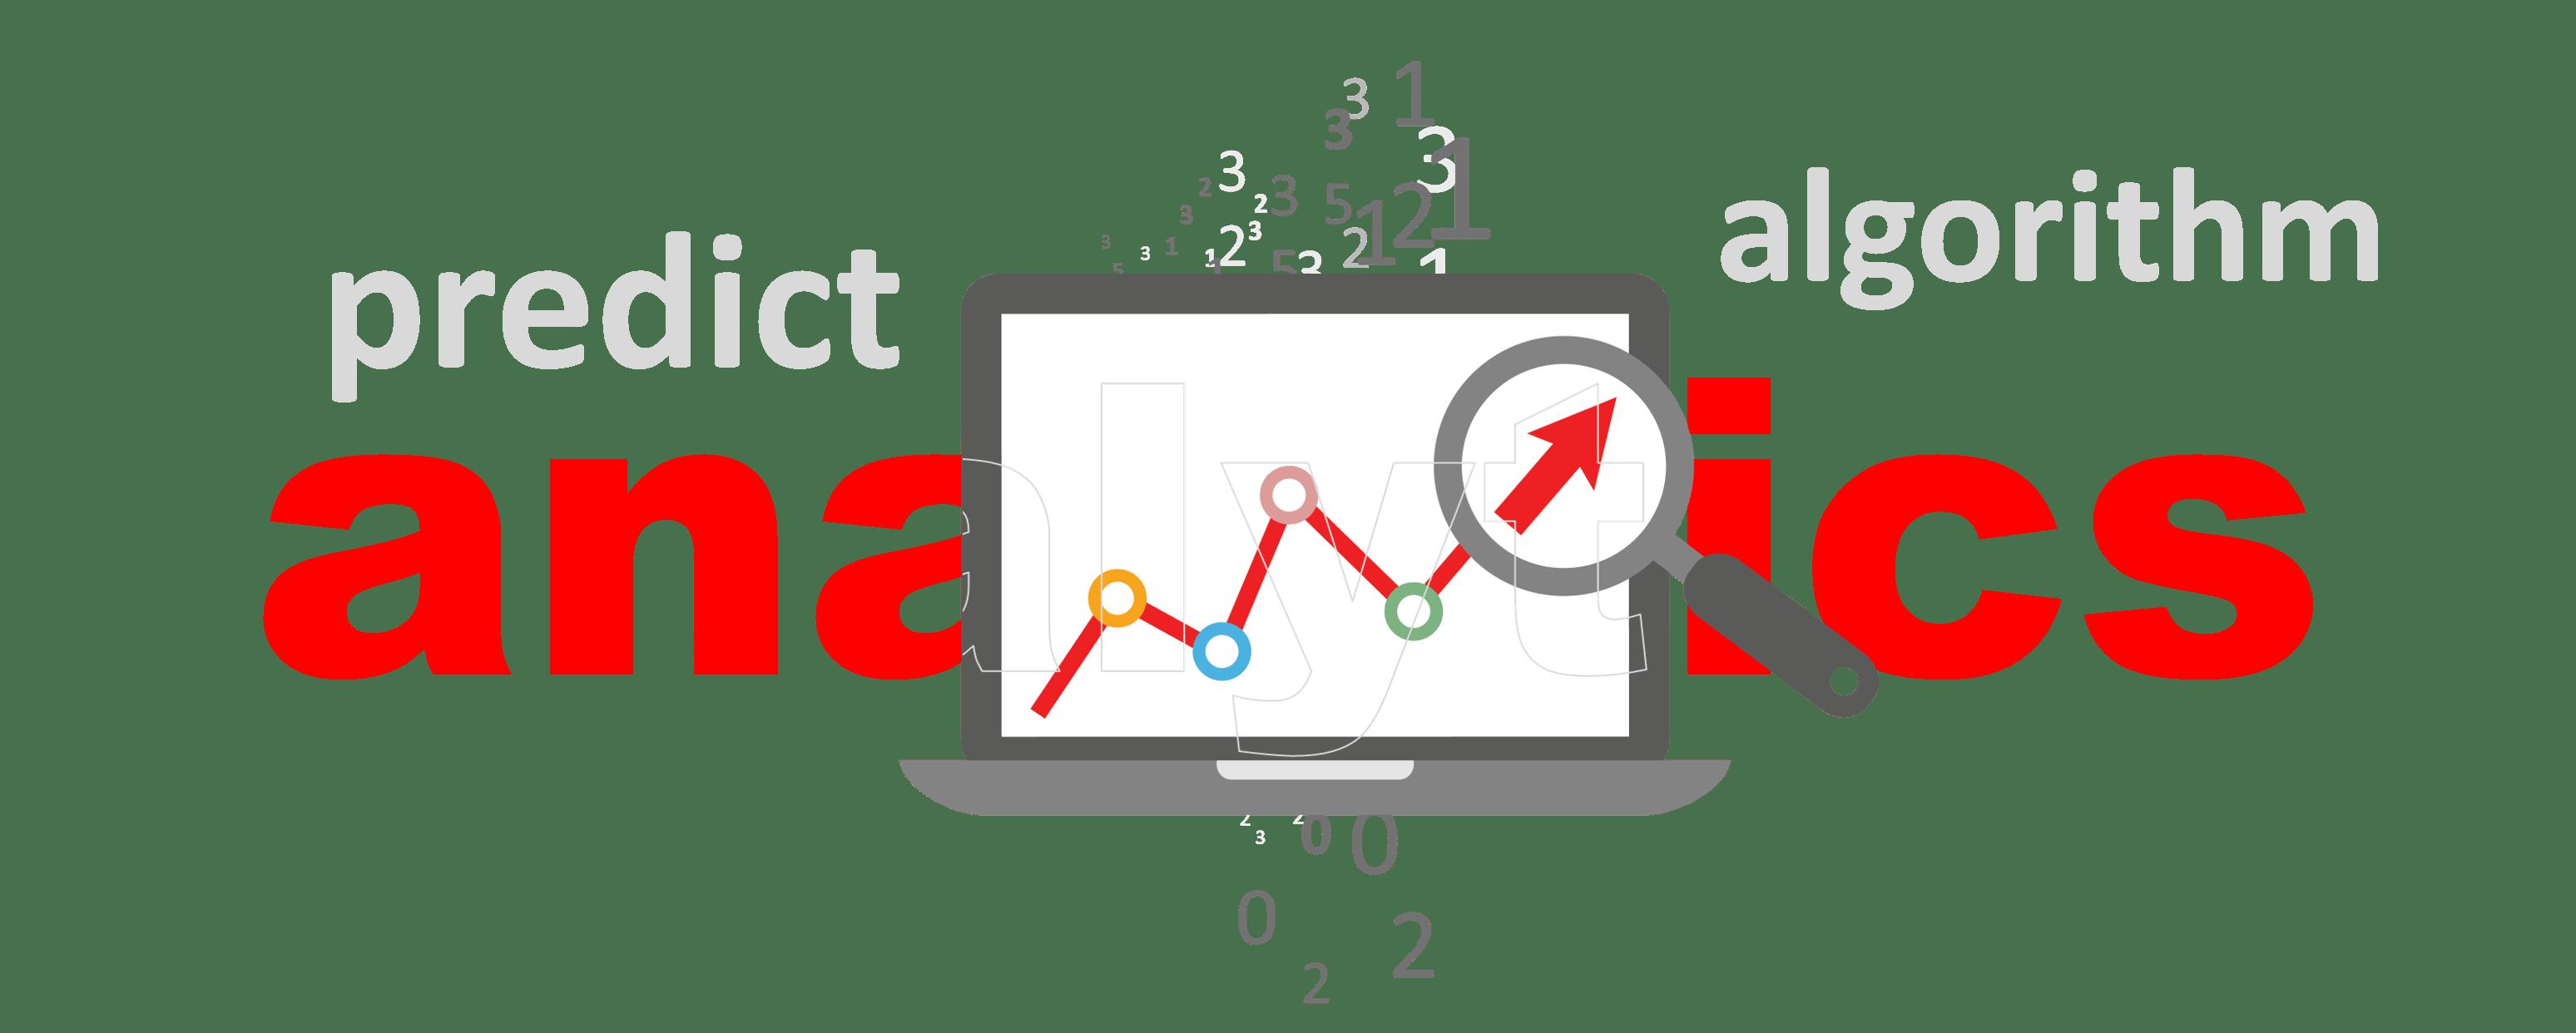 Teamwork clipart team structure. Analytics scope growth pitstop